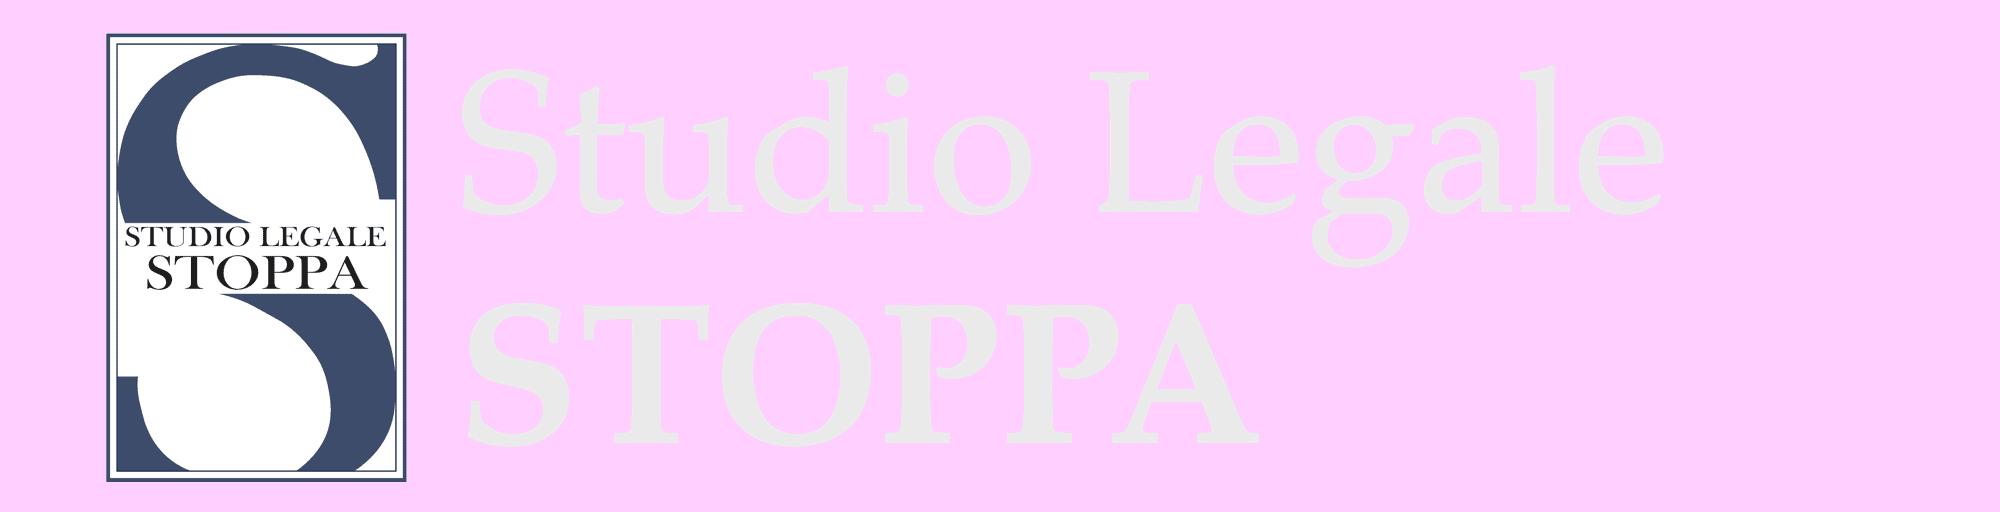 https://studiolegalestoppa.it/wp-content/uploads/2020/08/logo_wide_margine_white-1.png